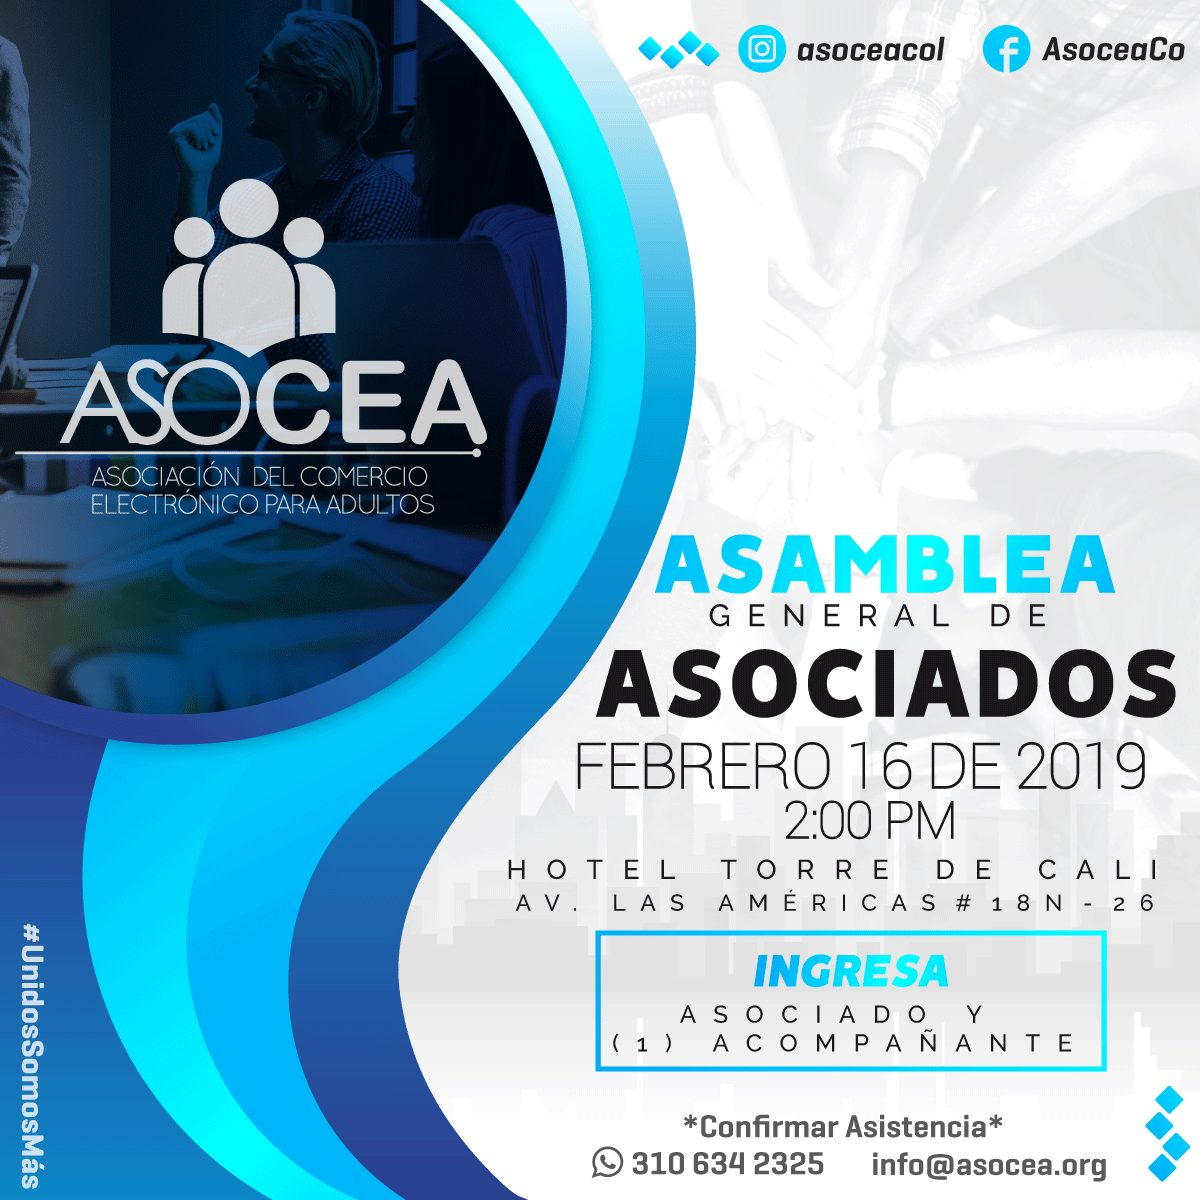 Asamblea general de Asociados ASOCEA MaJu Studios